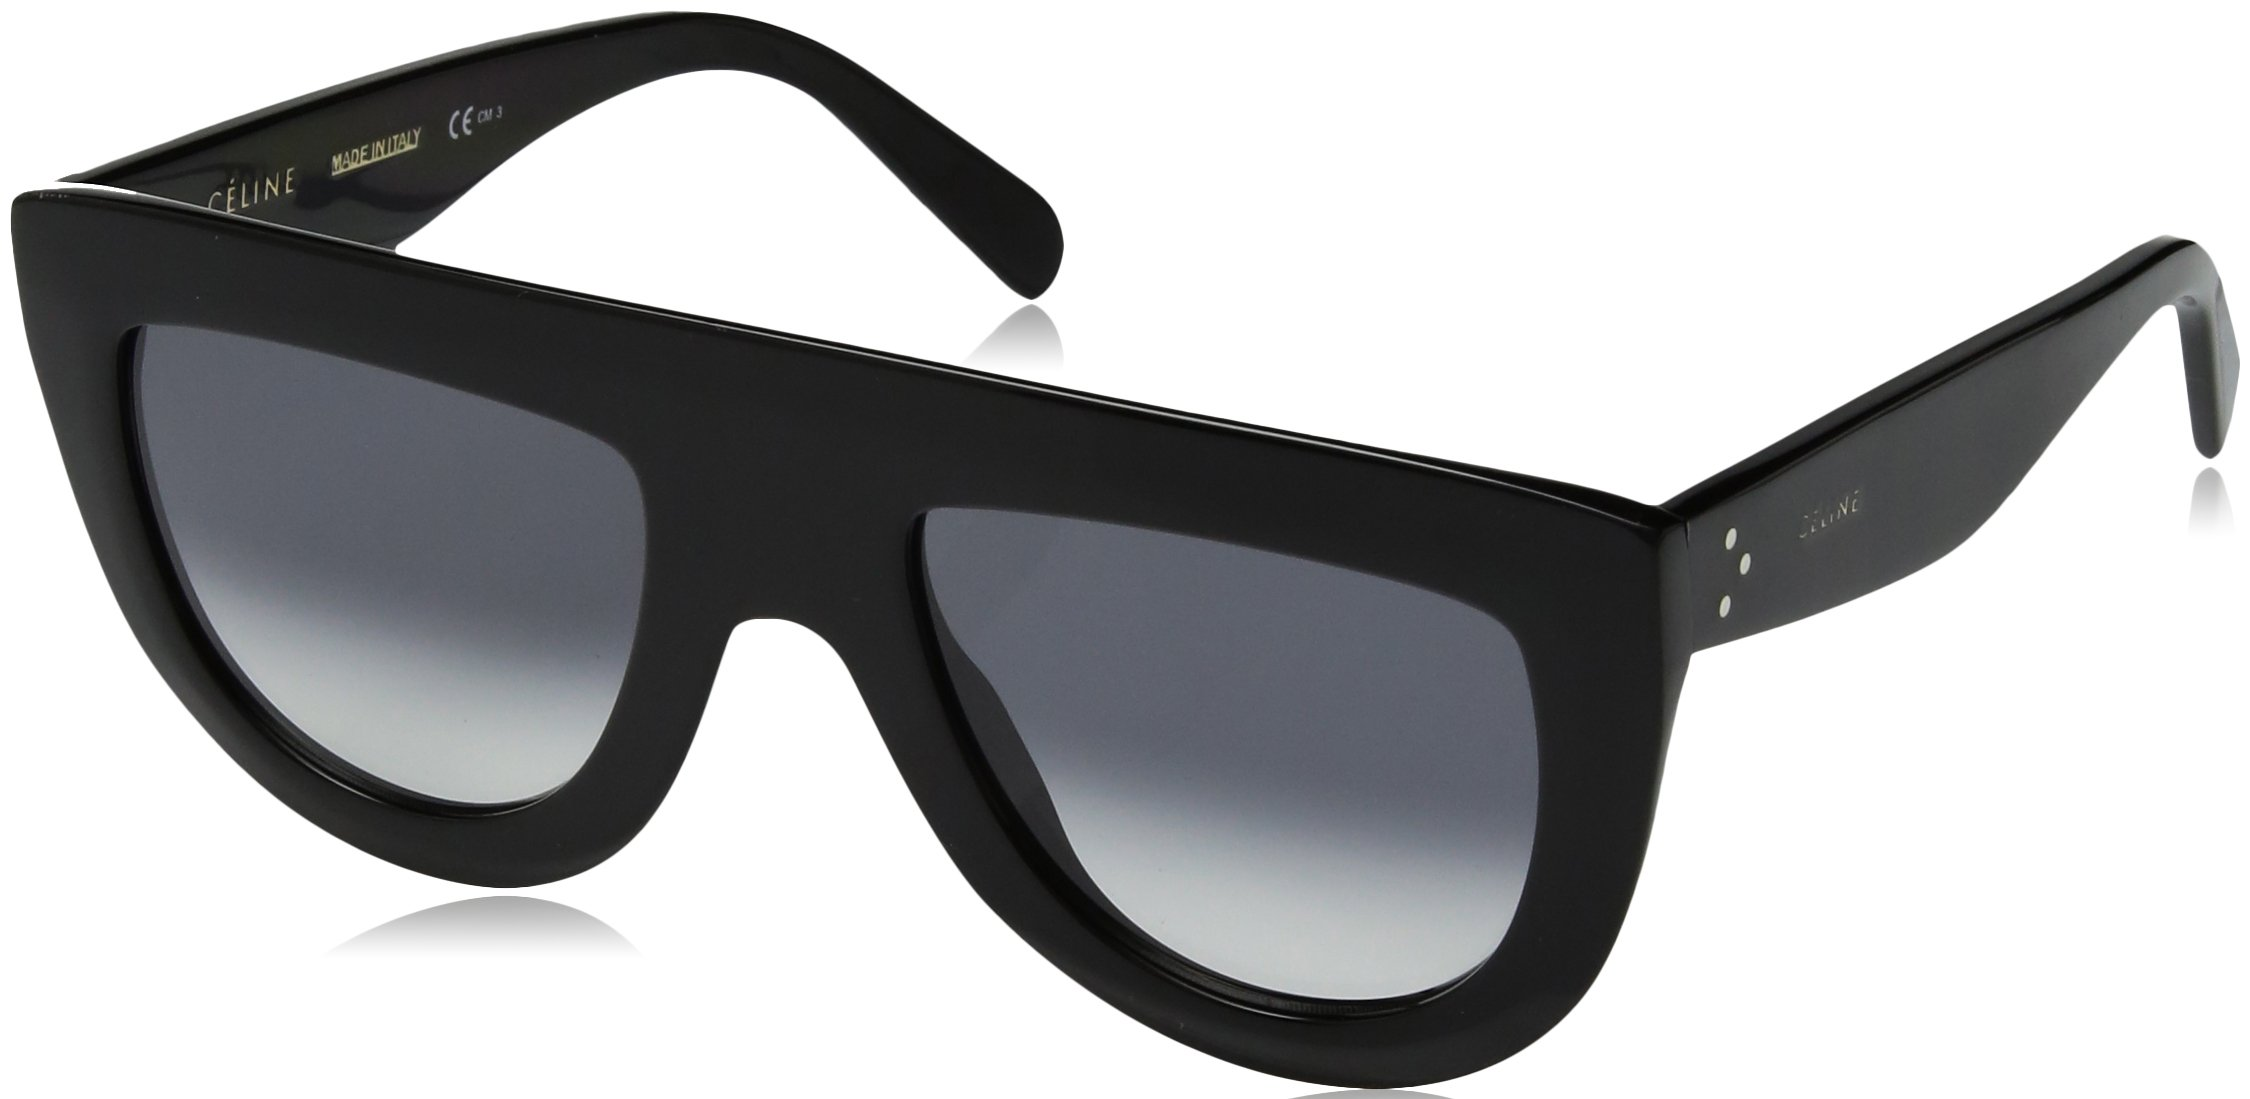 54ca4a898e Celine Womens Women s Cl41398 S 52Mm Sunglasses